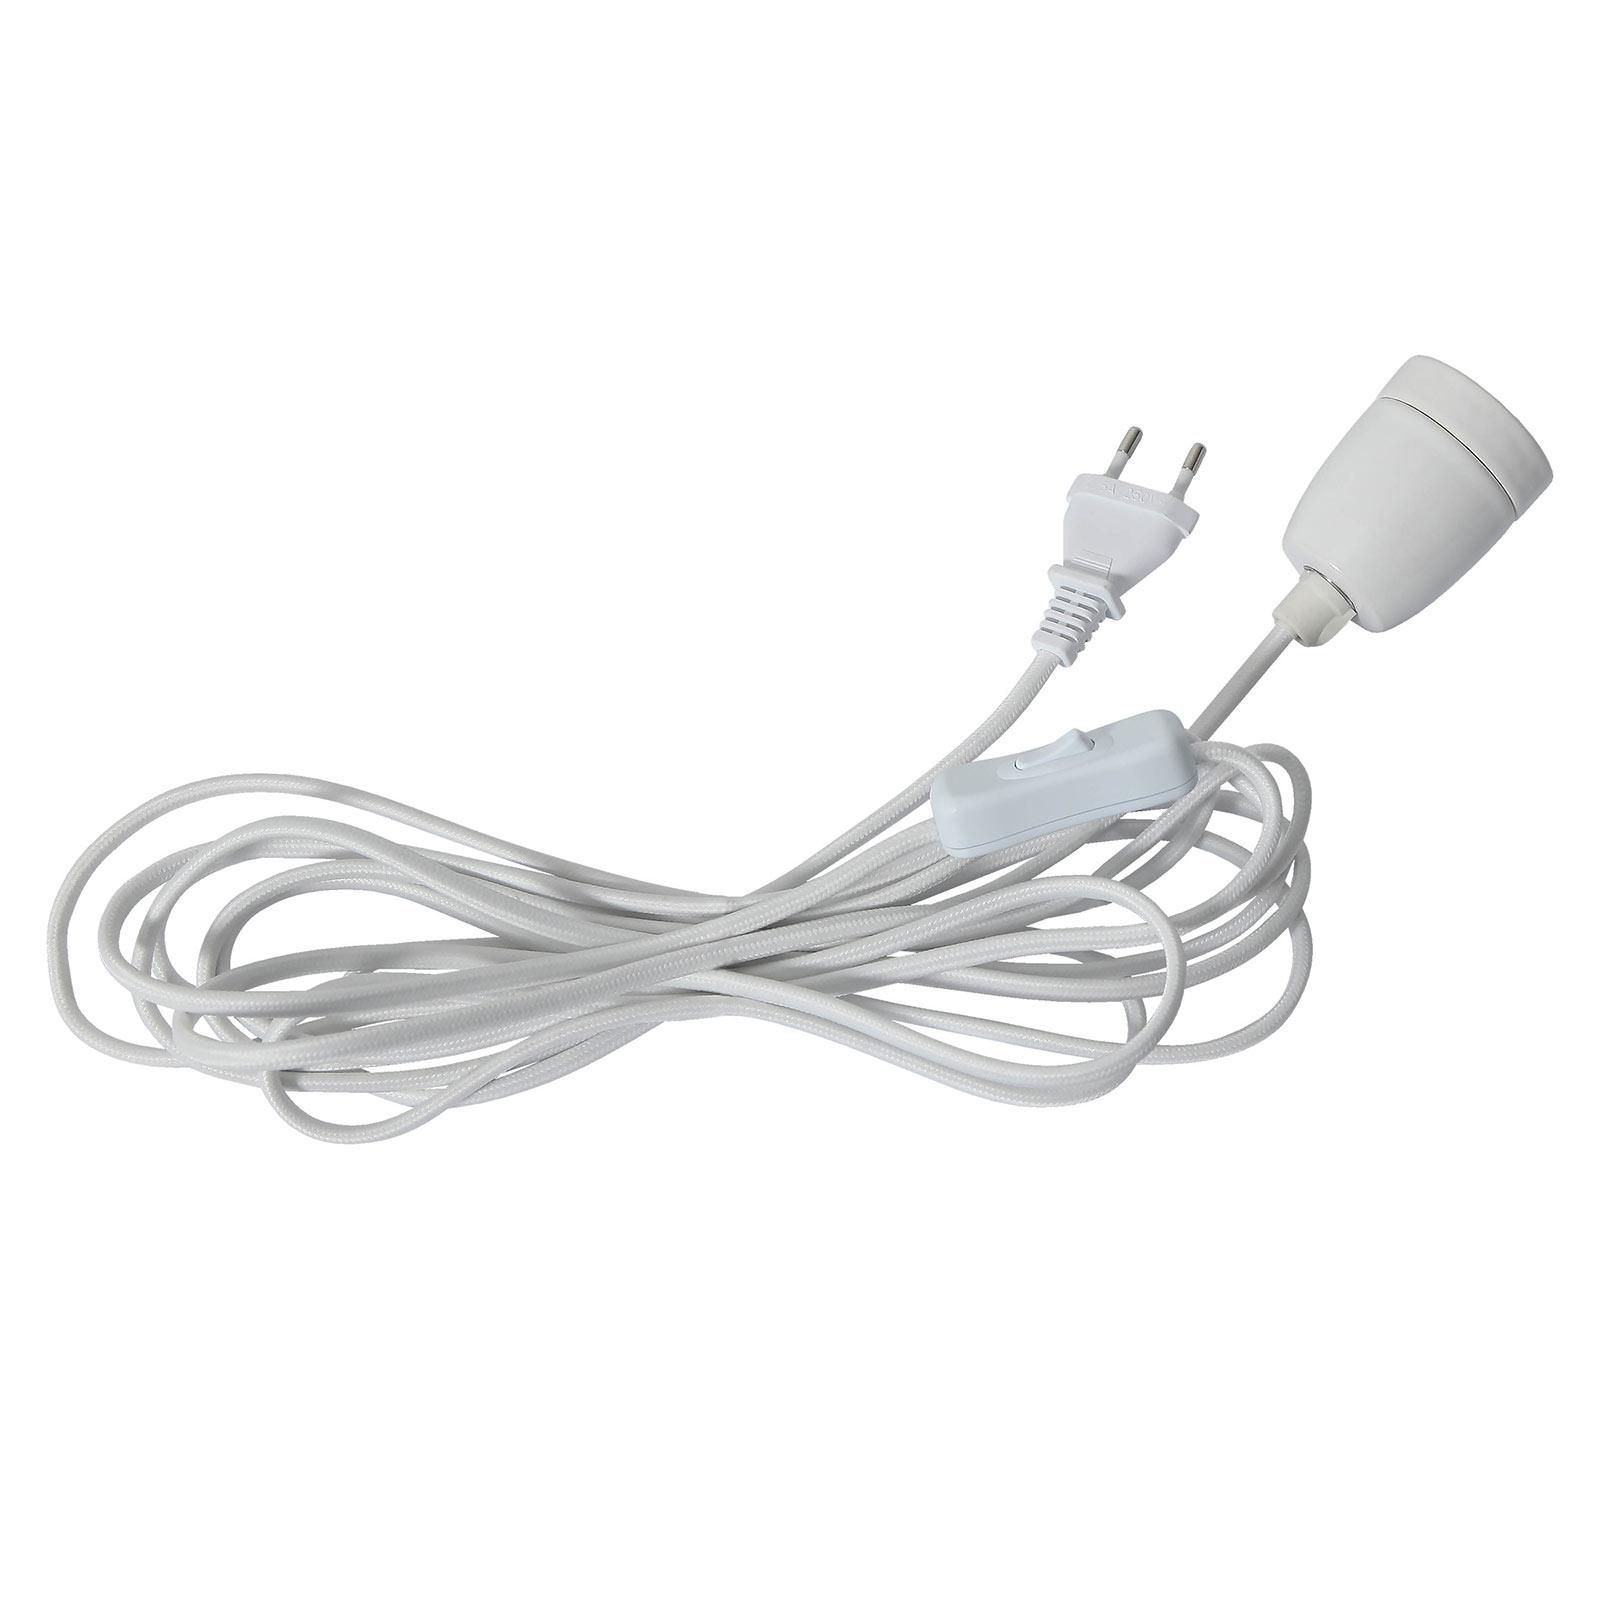 Douille E27 Glaze avec câble, blanc